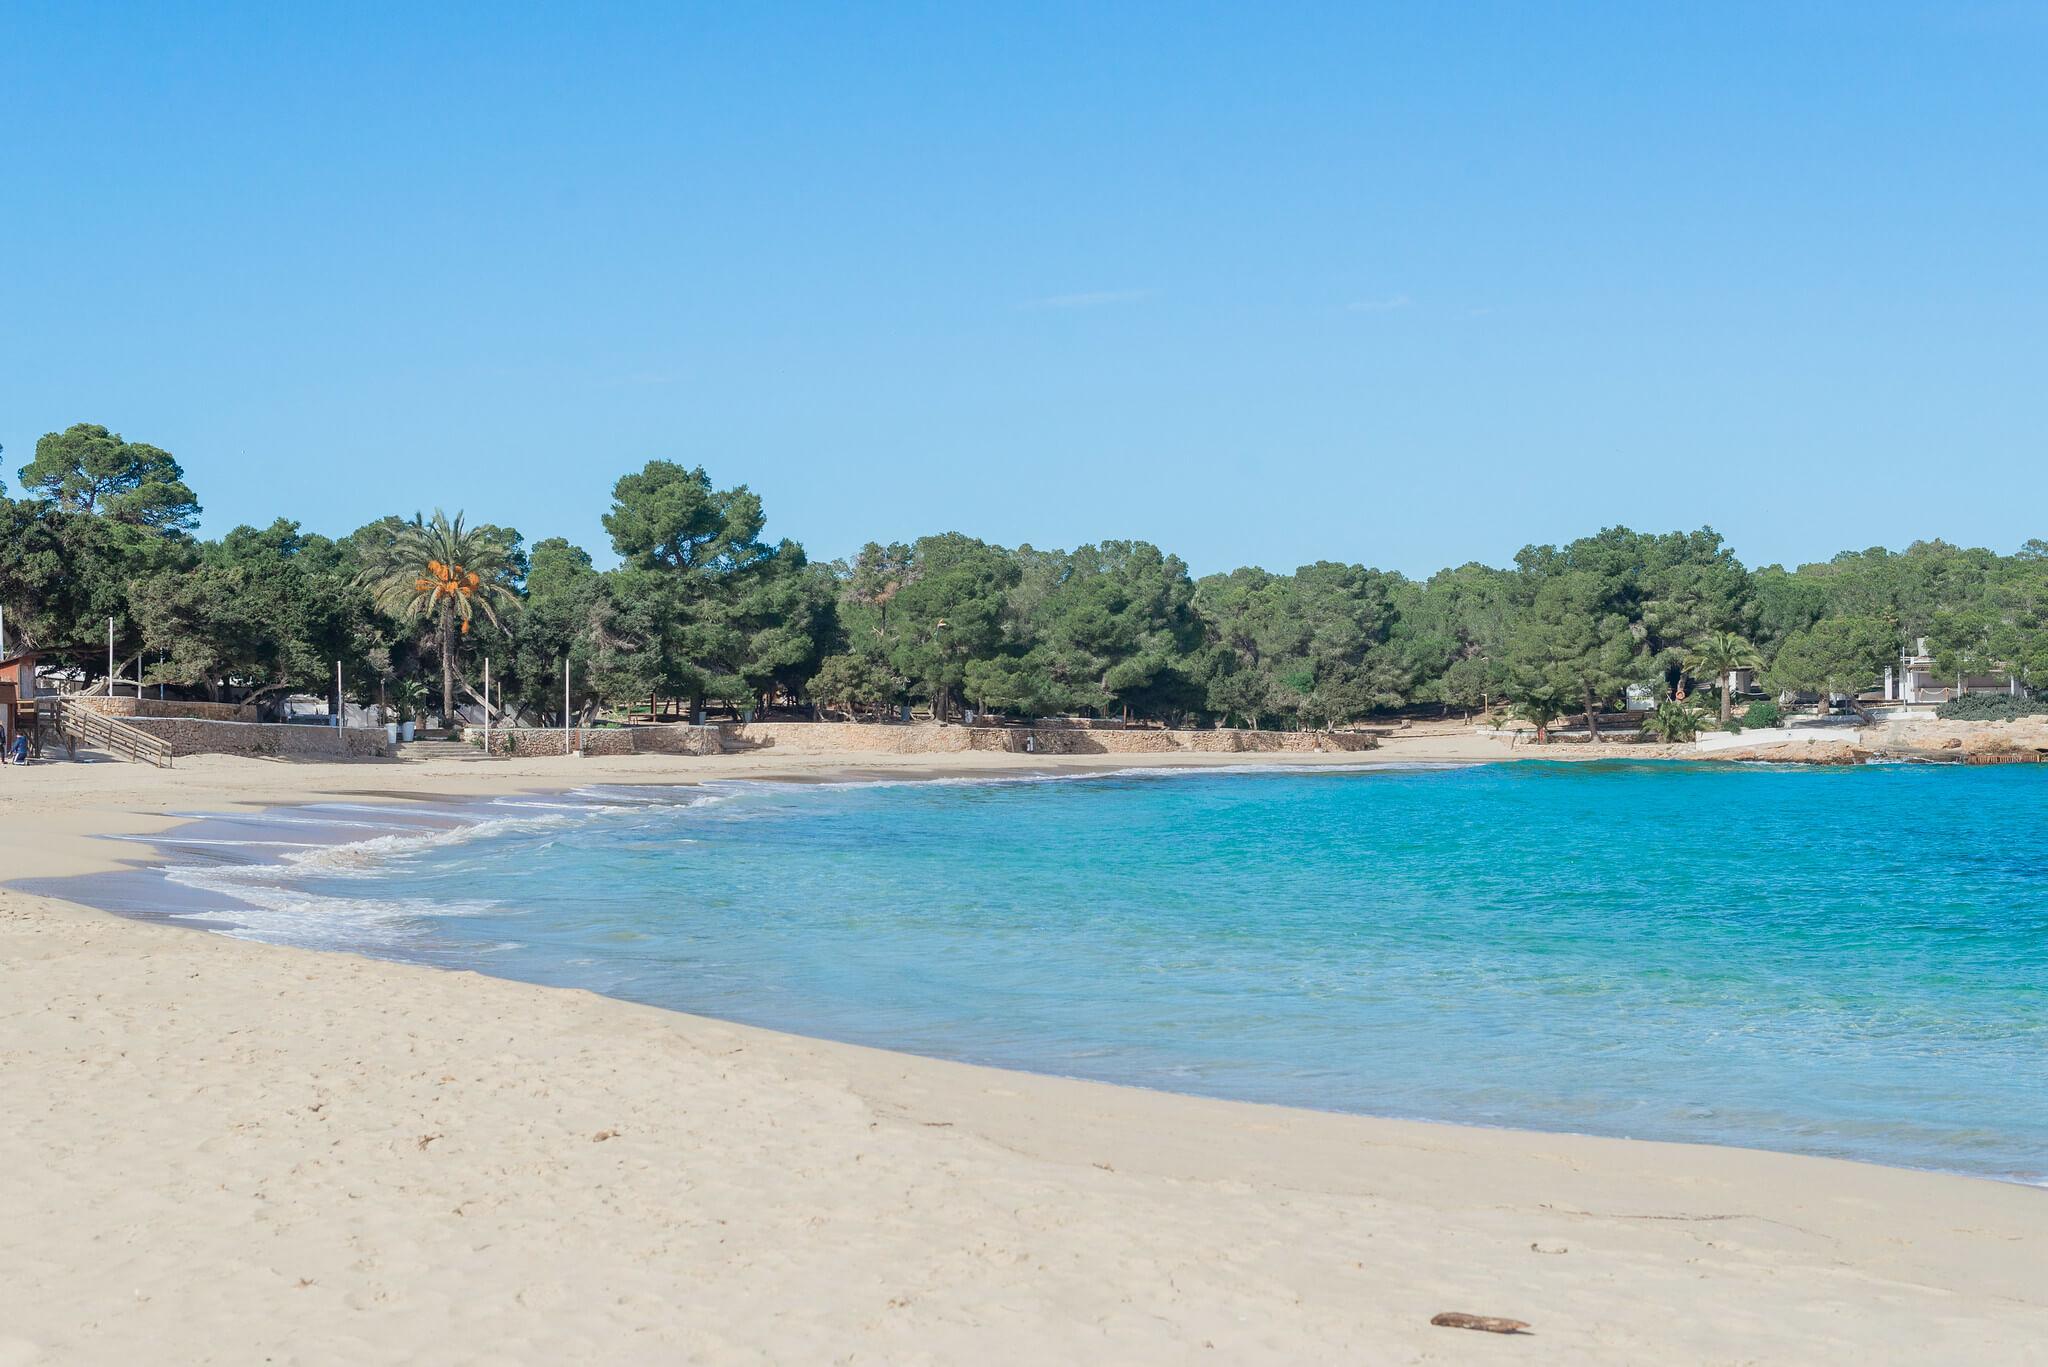 https://www.white-ibiza.com/wp-content/uploads/2020/03/ibiza-beaches-cala-bassa-06.jpg